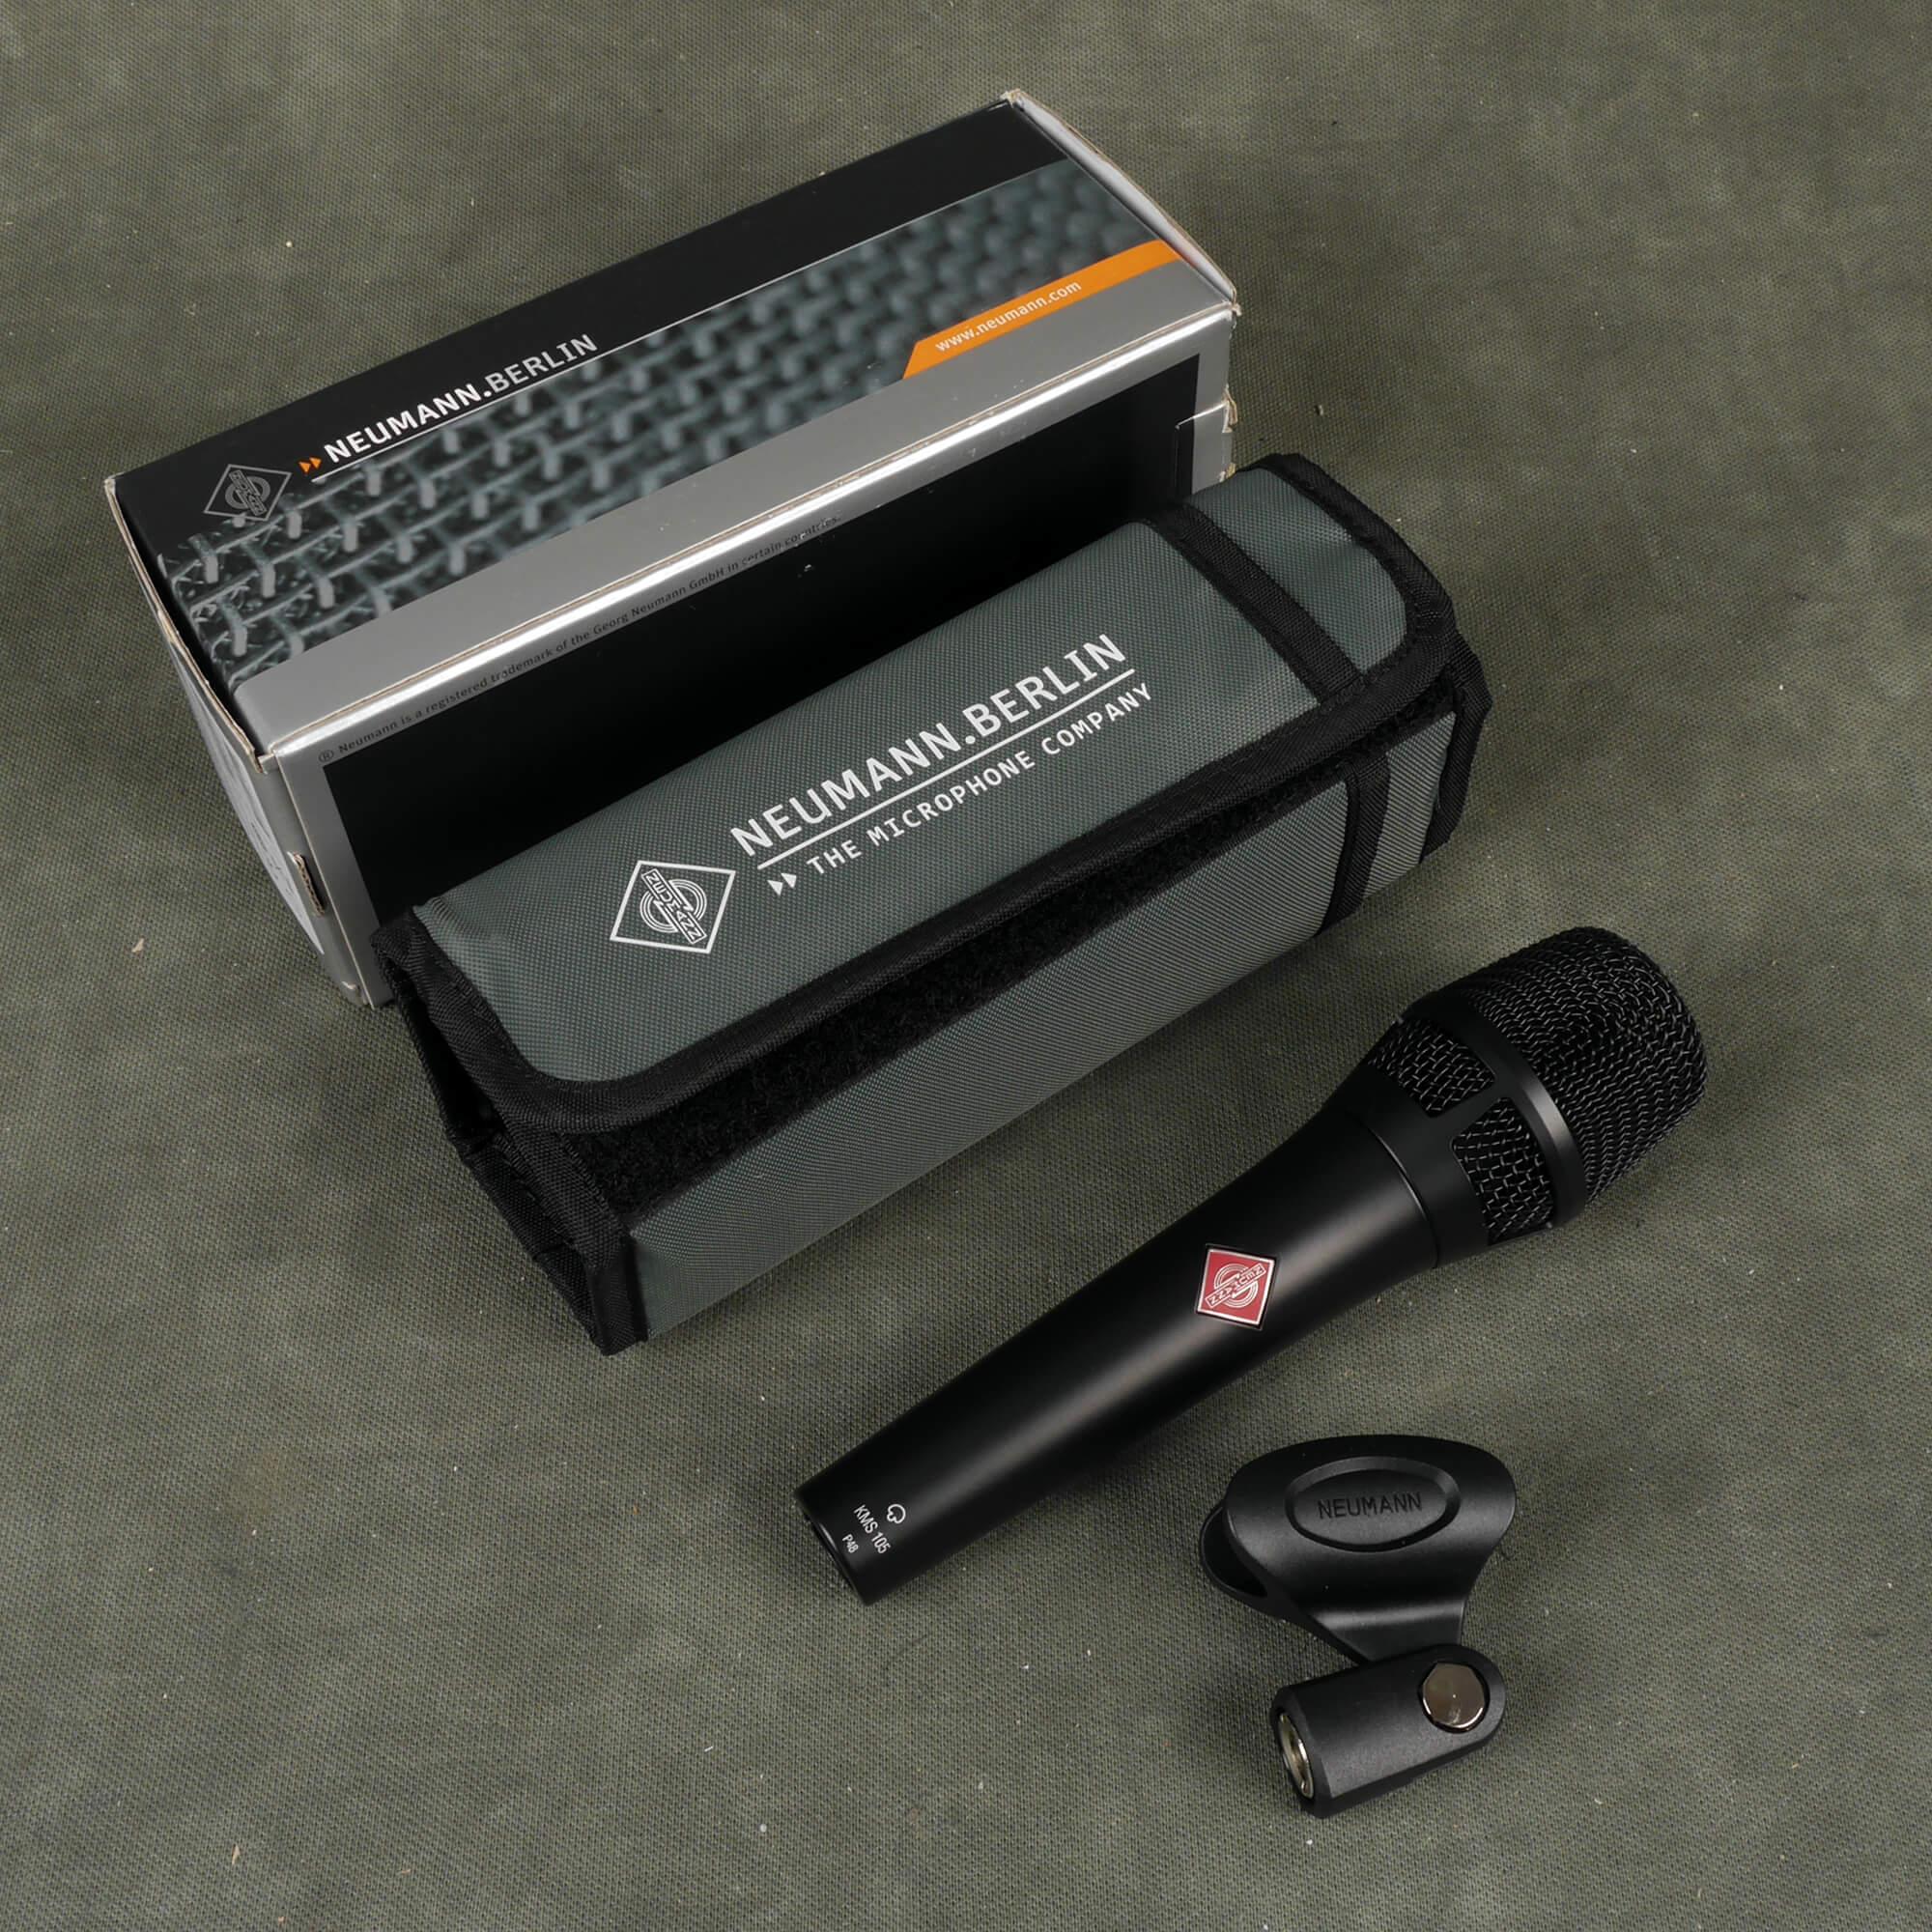 Neumann KMS105 BK Condenser Microphone w/Box - 2nd Hand